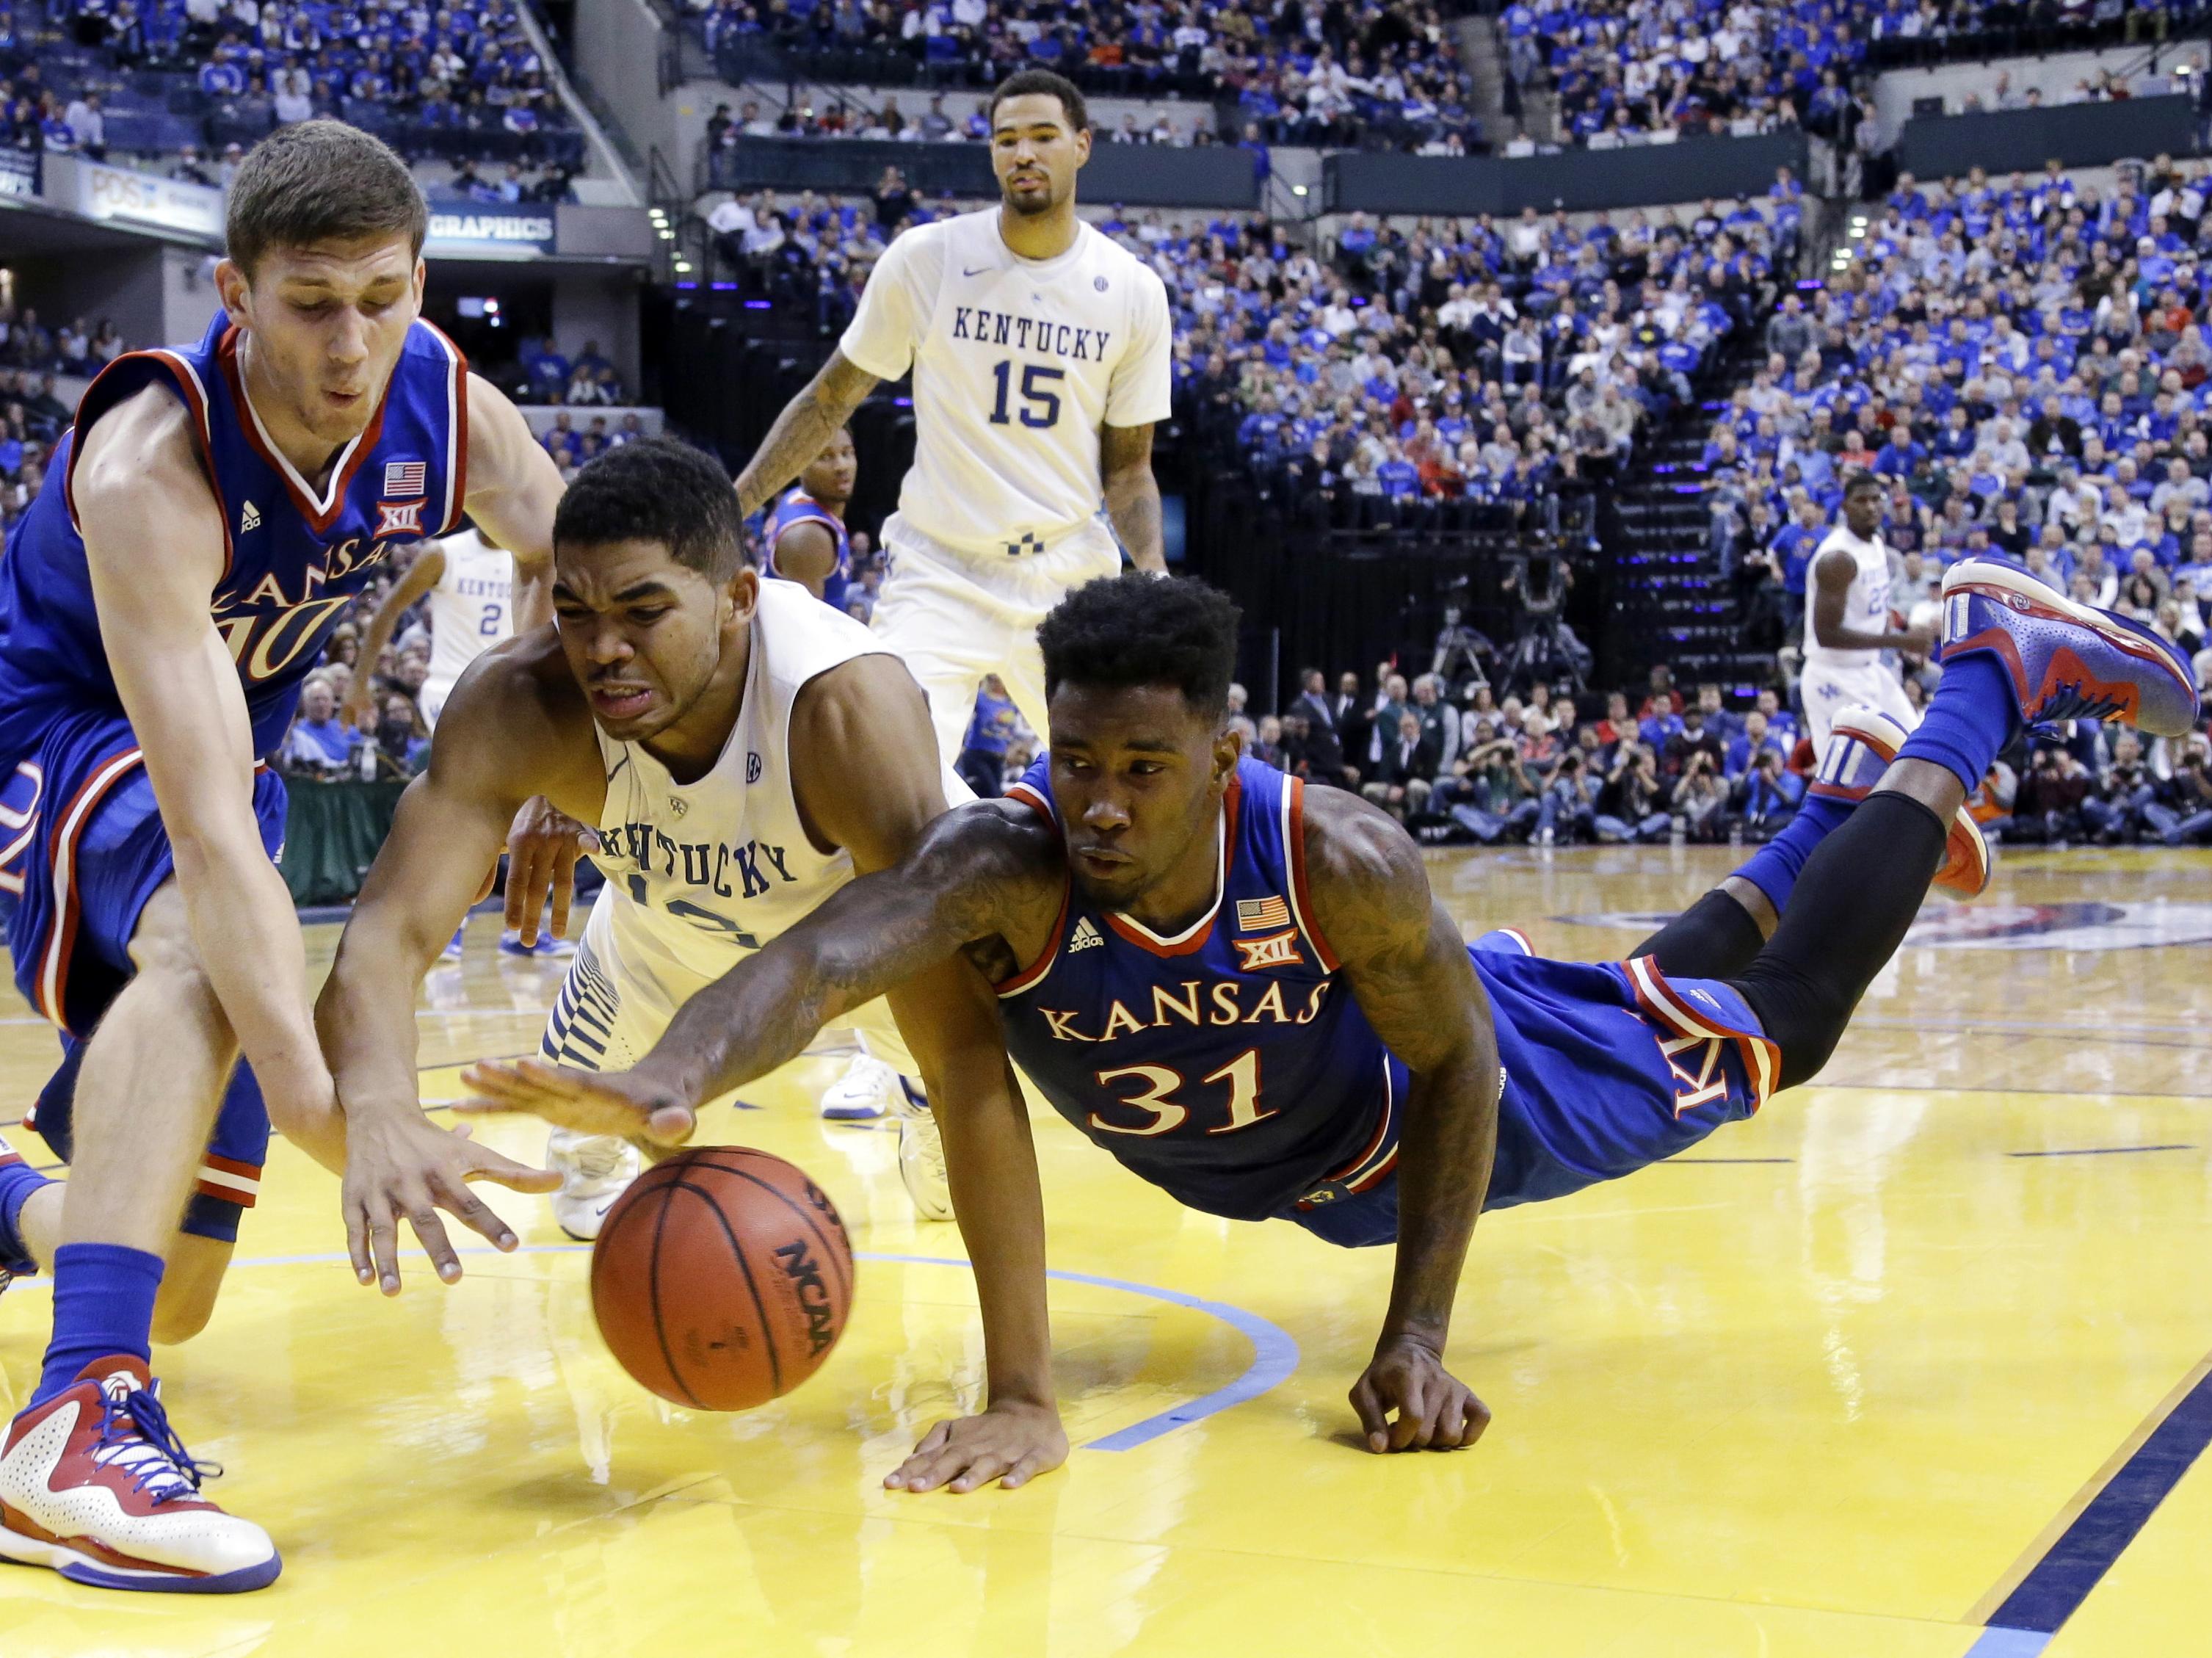 APTOPIX Kentucky Kansas Basketball